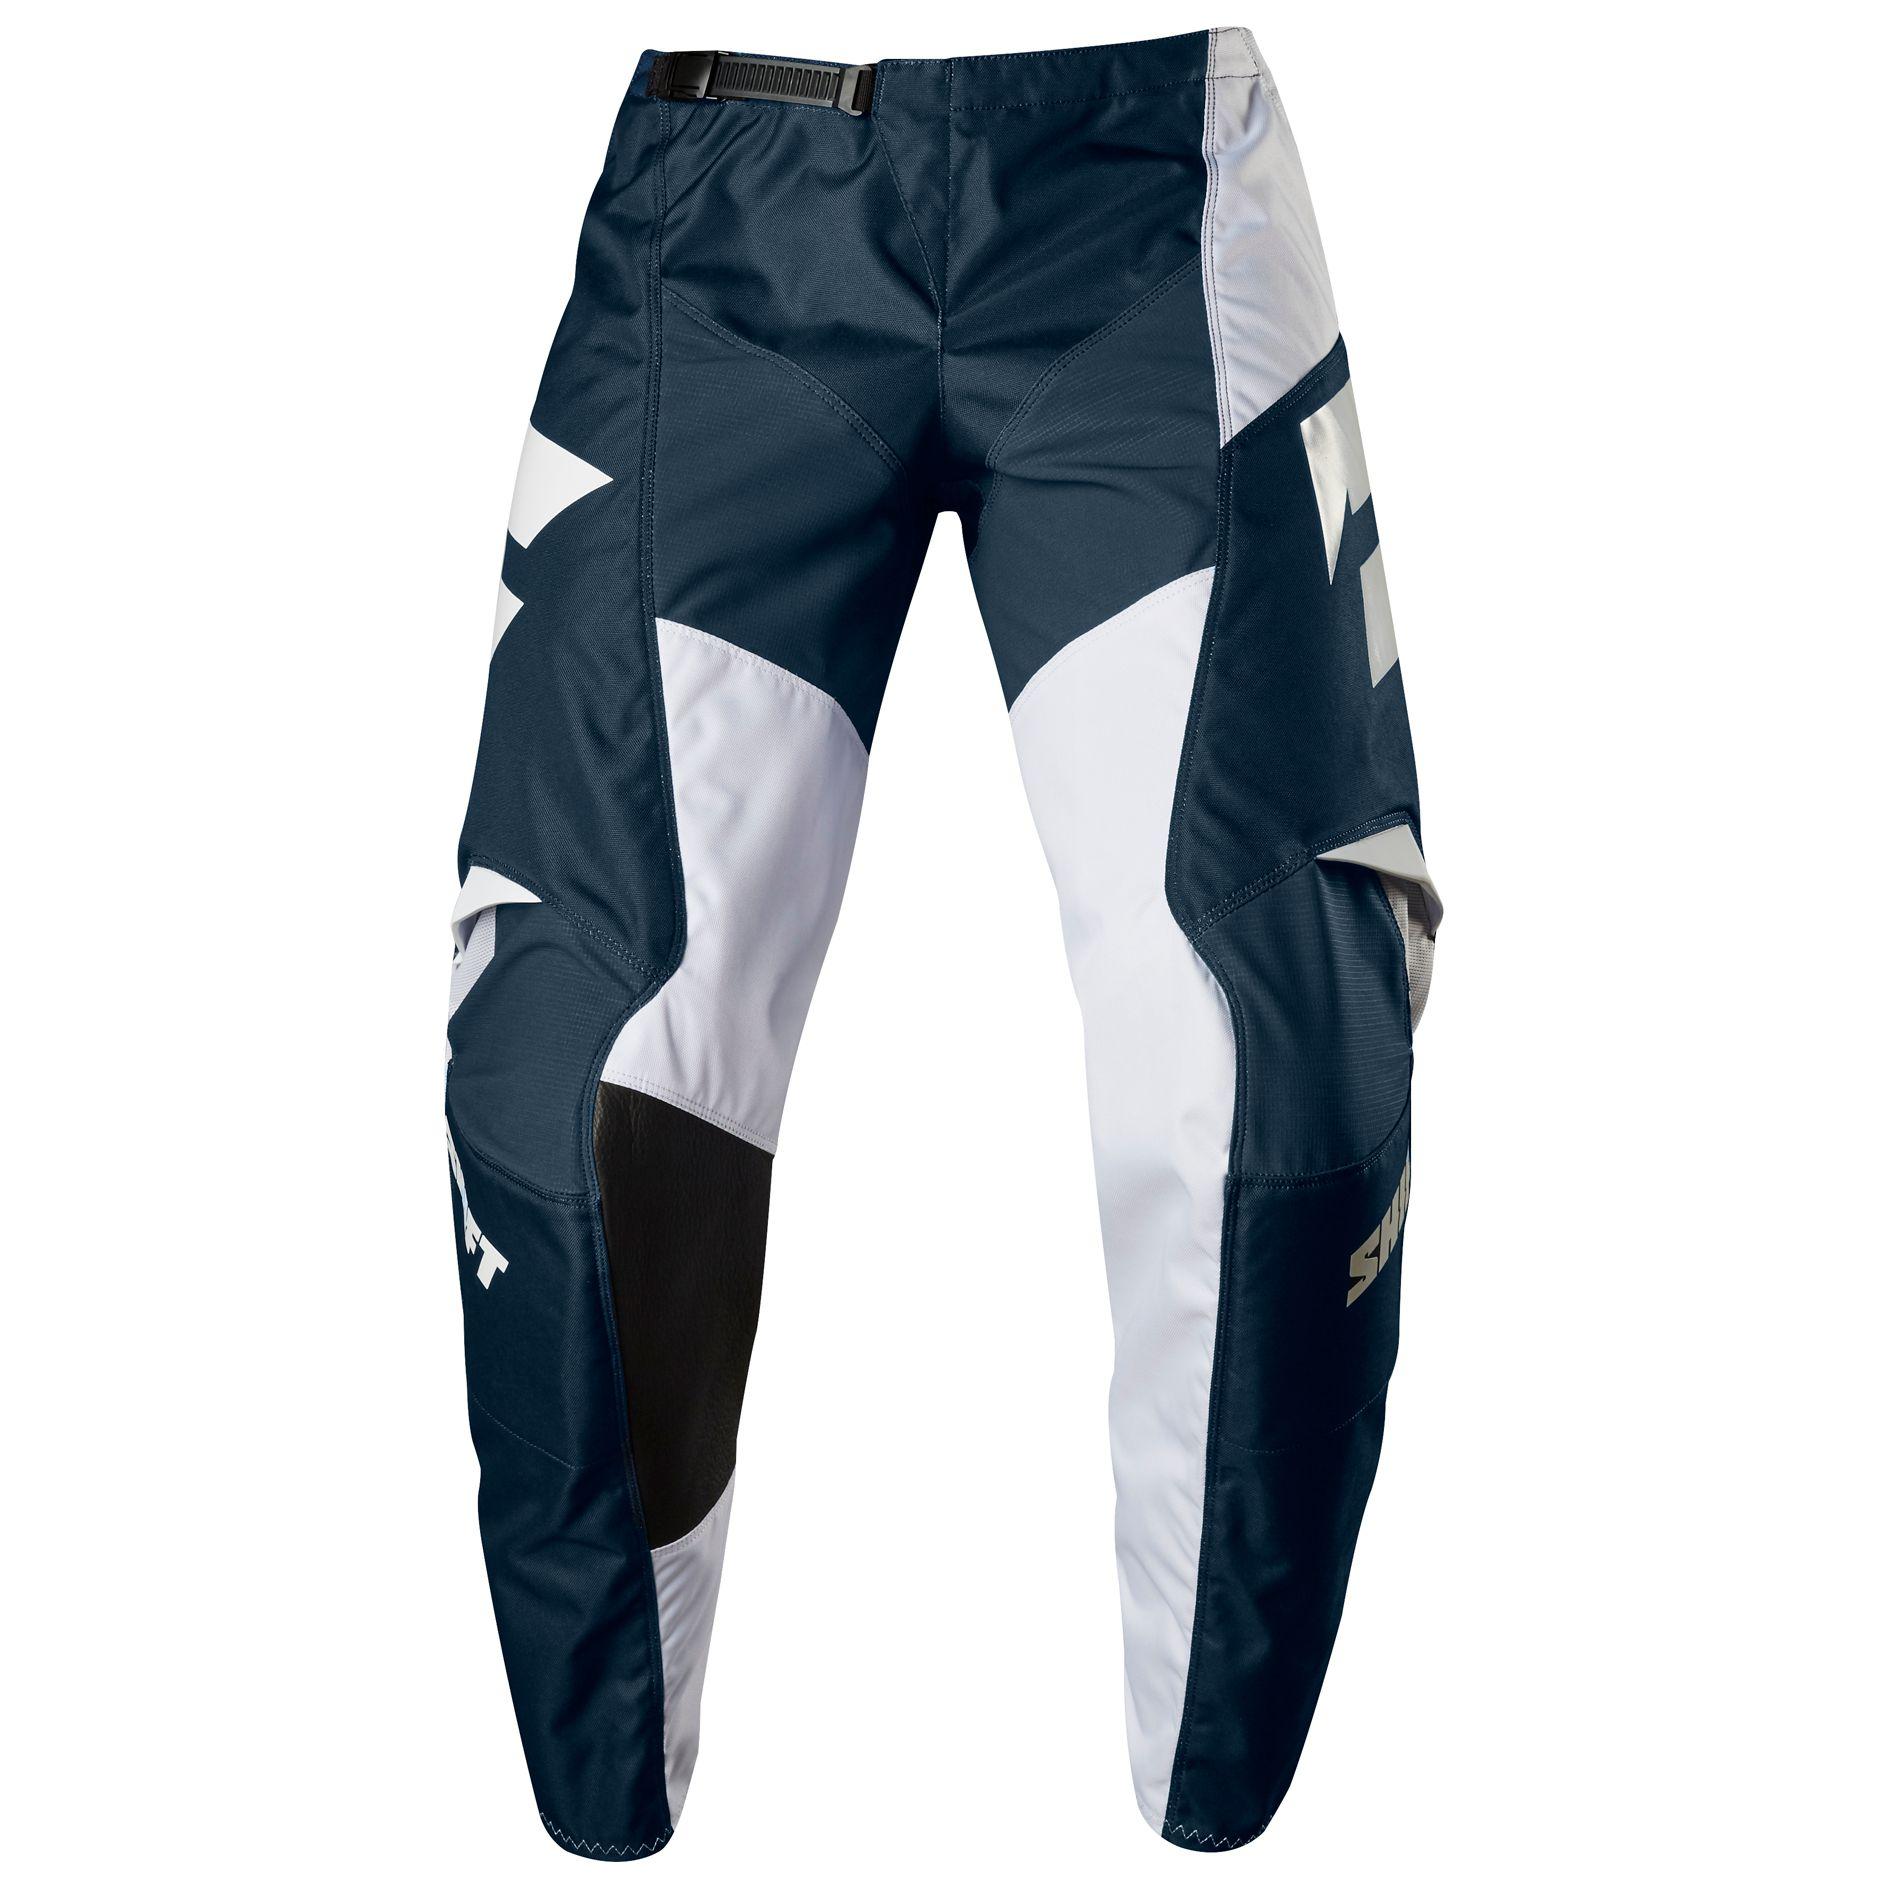 Pantalon cross Shift WHIT3 LABEL NINETY SEVEN Navy 2018